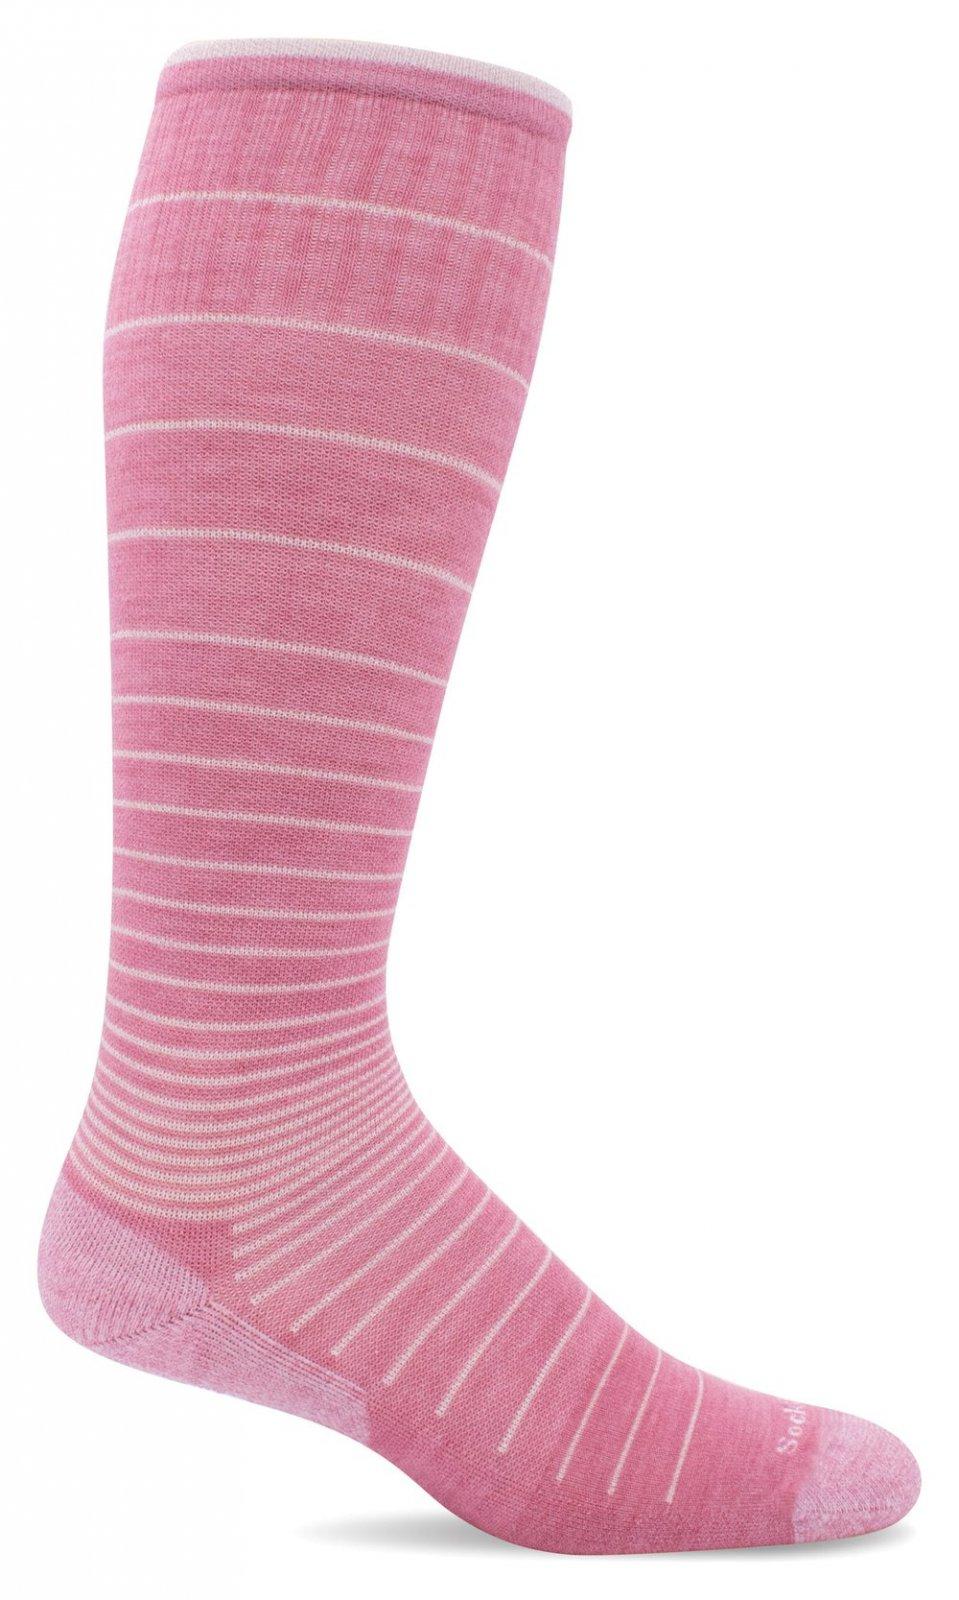 W's Sockwell Circulator Compression Sock - Lotus Sparkle